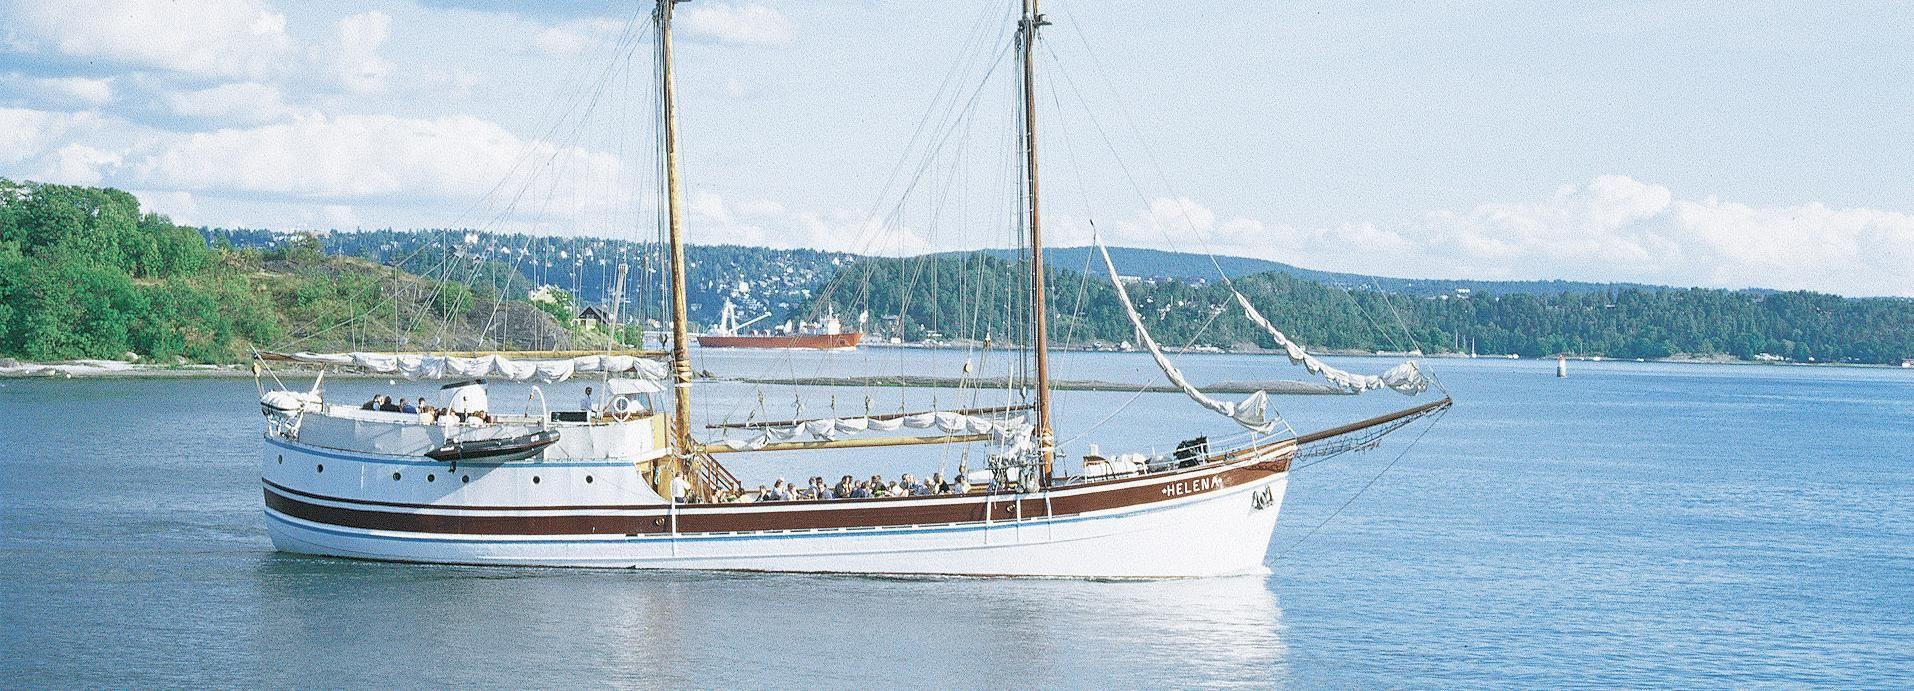 Segeln in Oslo: 3-stündige Jazz-Bootsfahrt mit Buffet